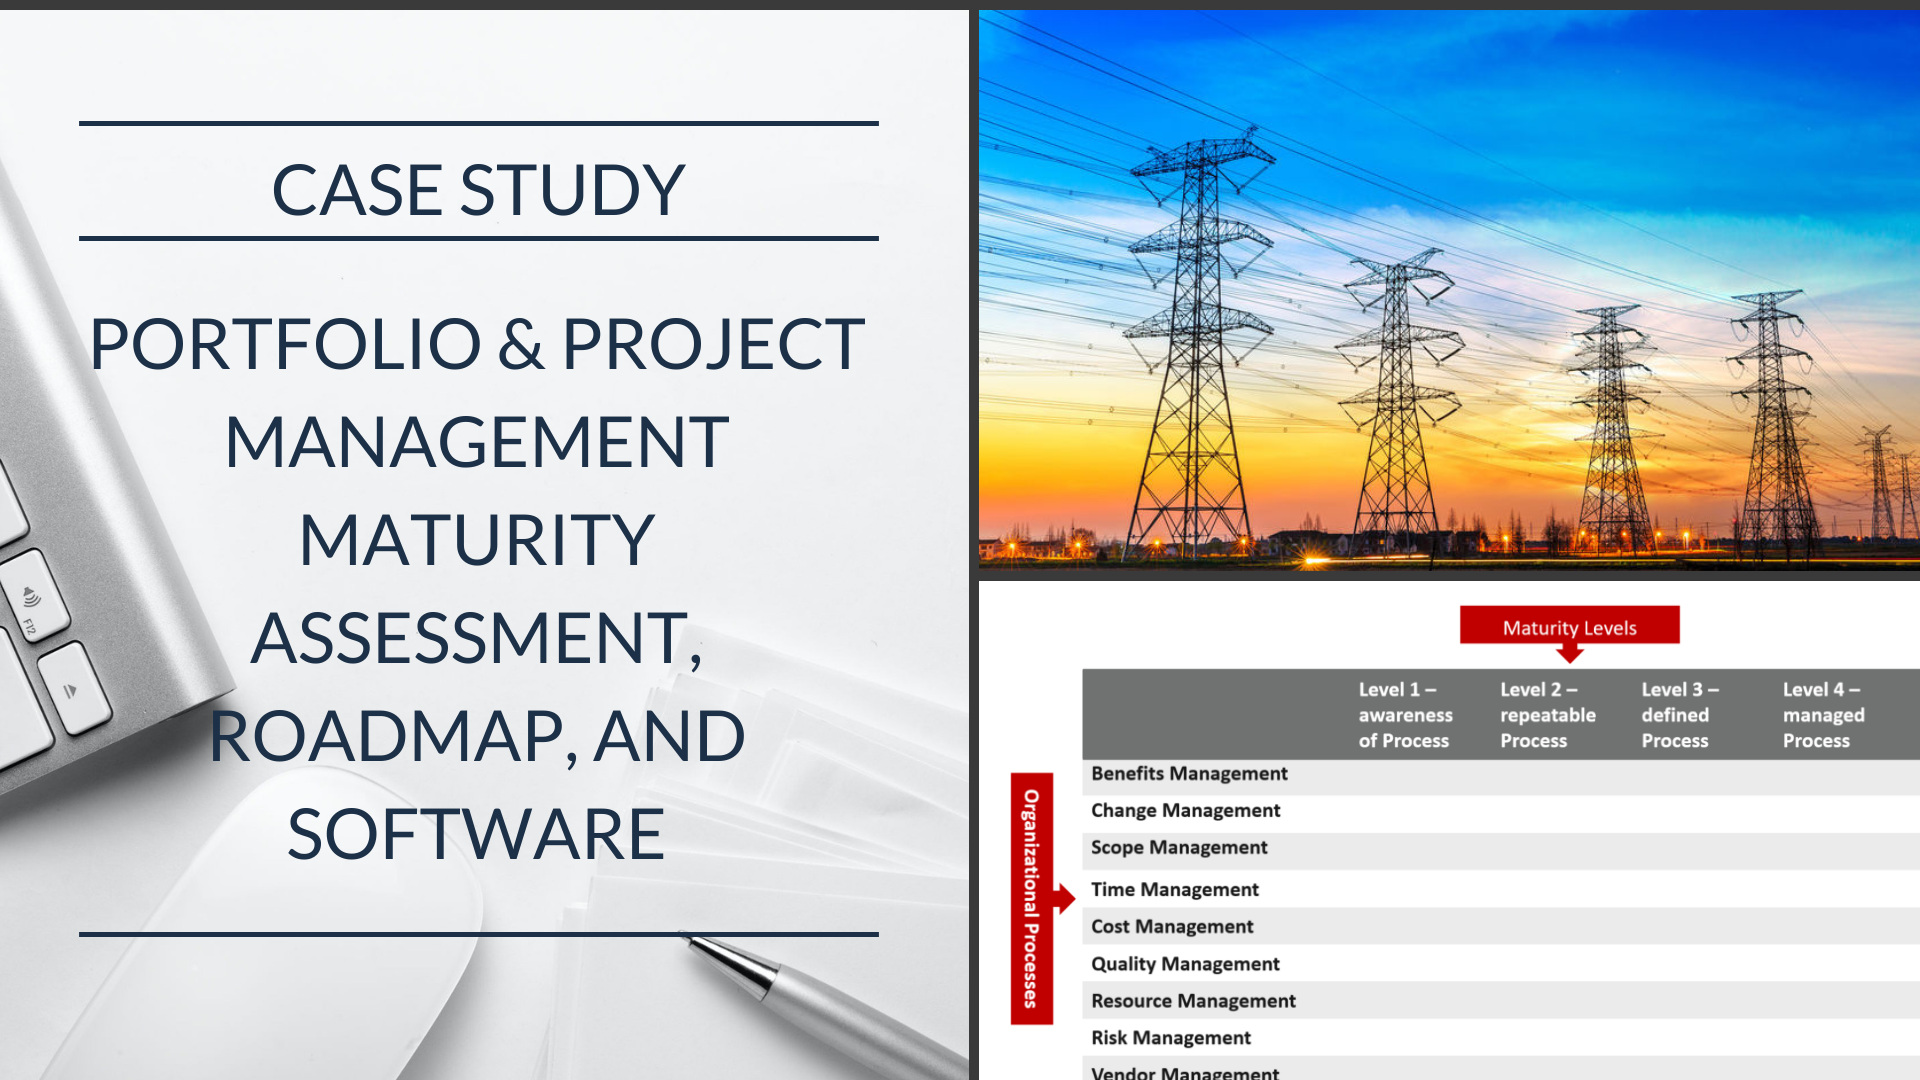 PPM Maturity Assessment and Software Optimum